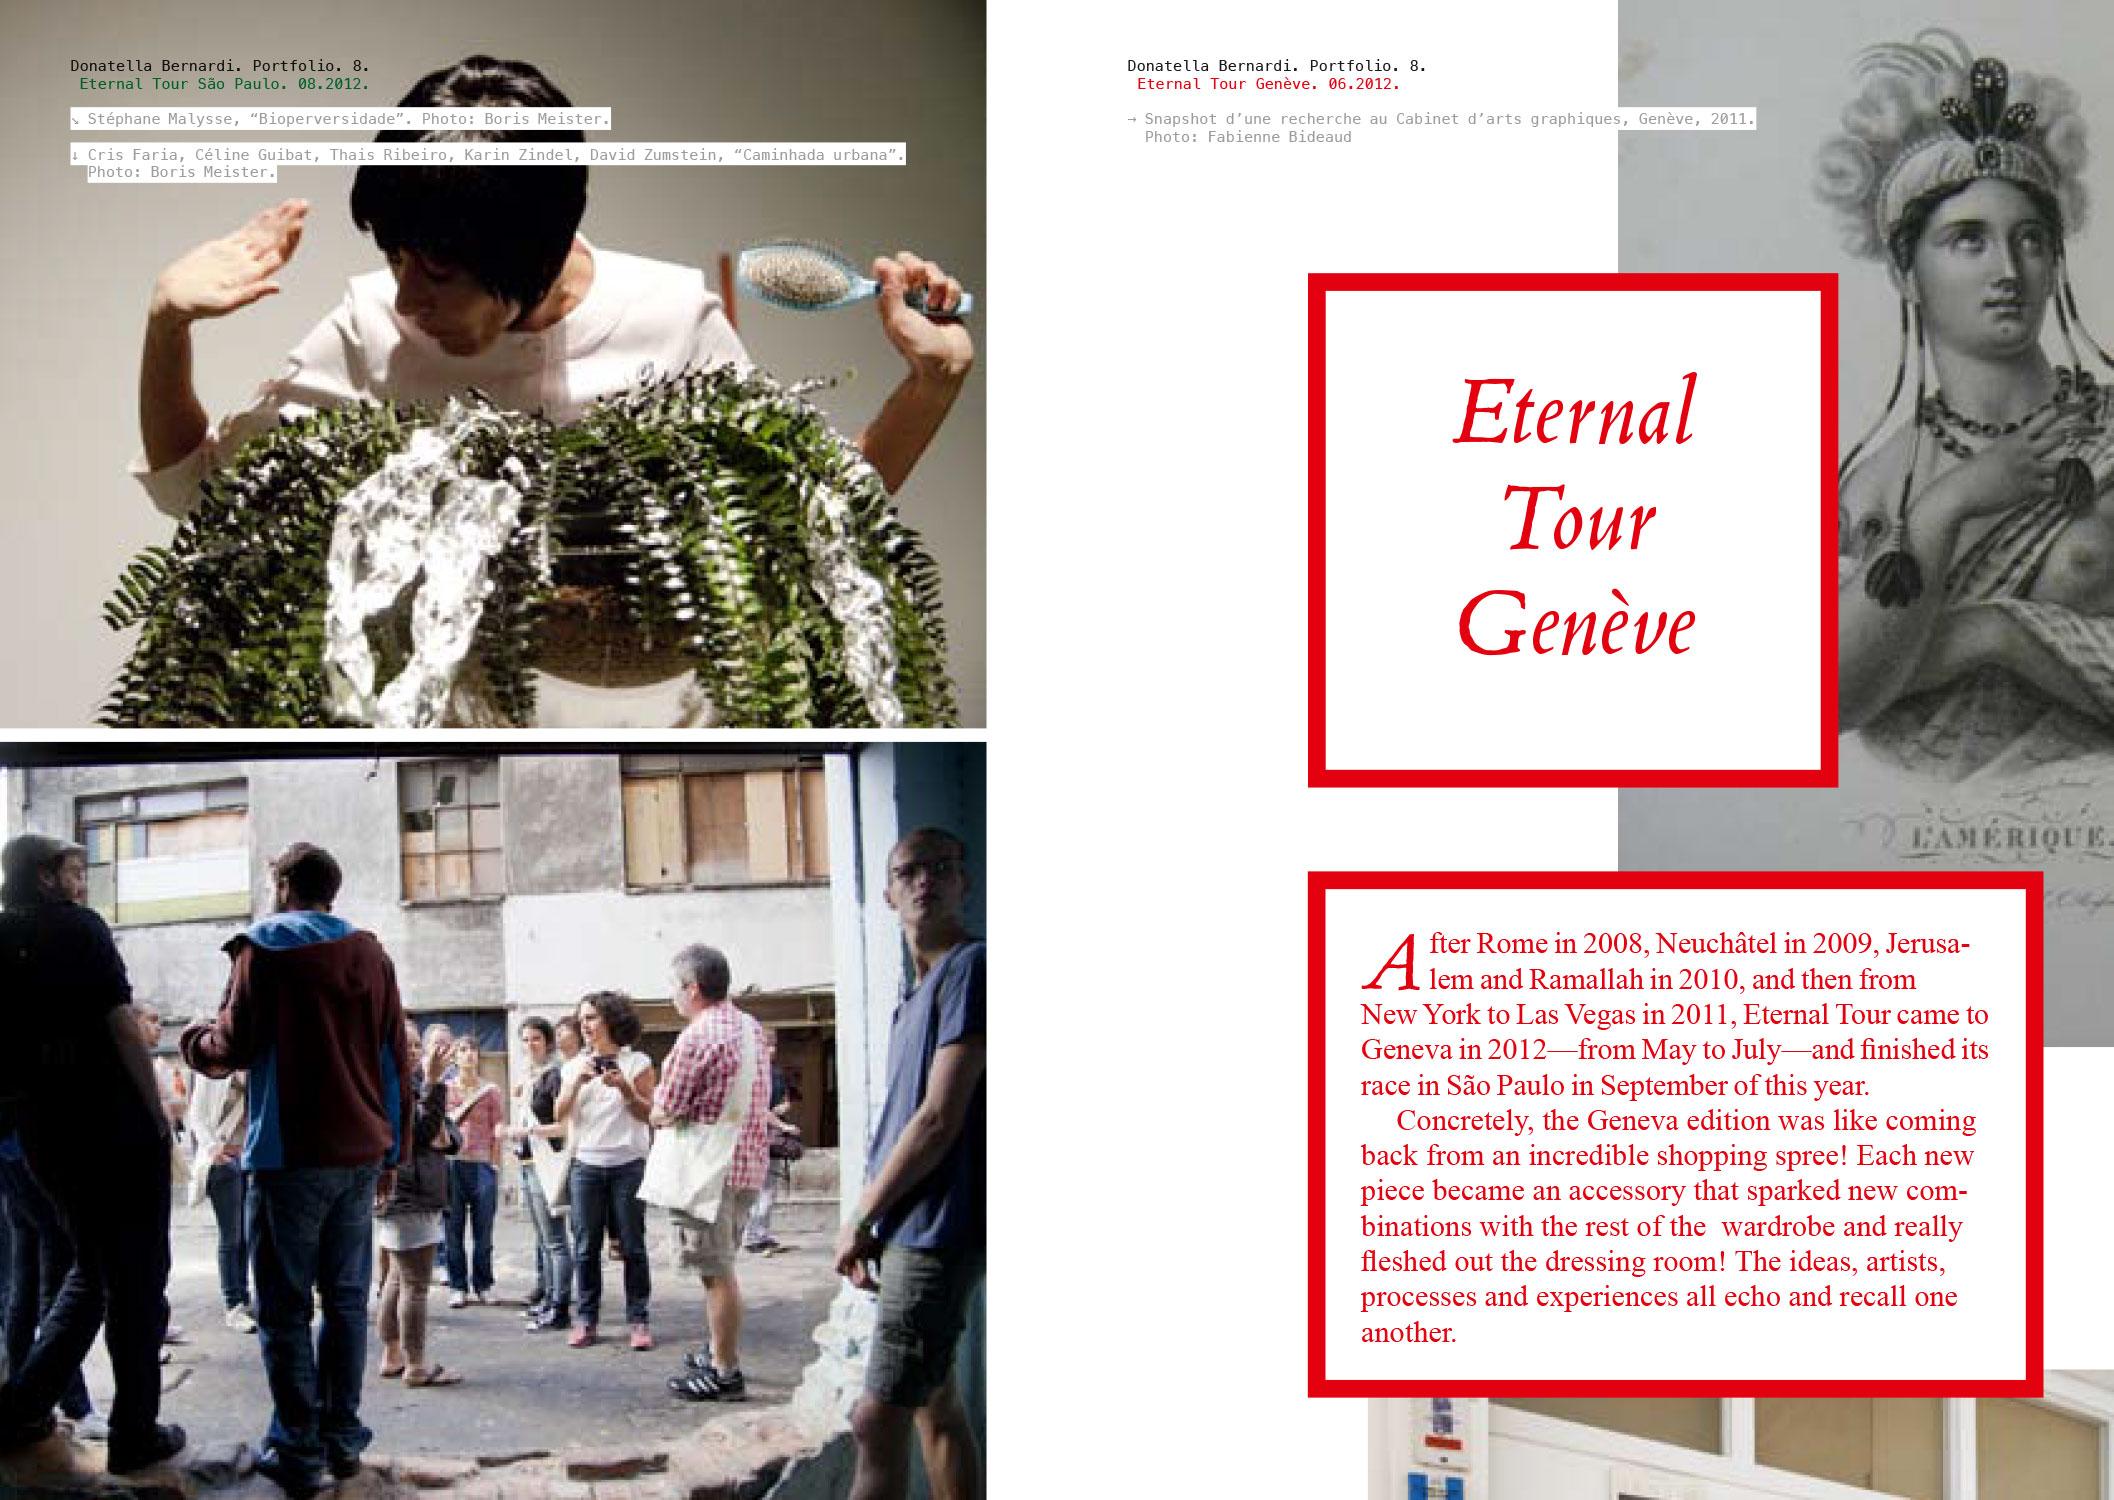 Portfolio de l'artiste/curatrice Donatella Bernardi.